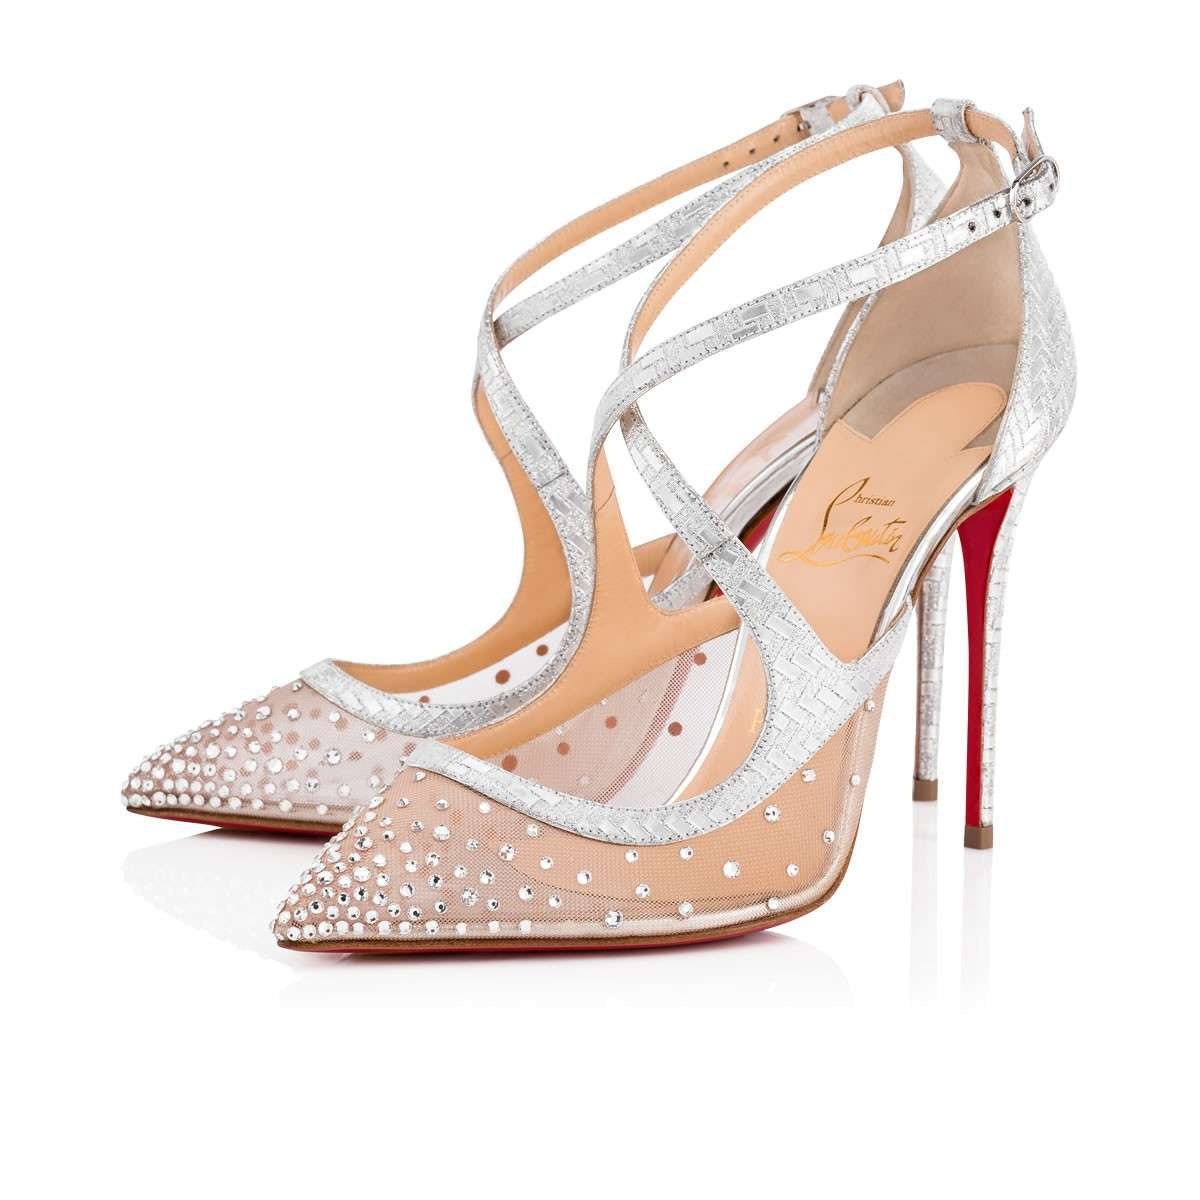 Scarpe da sposa a punta con tacco Christian Louboutin con cristalli